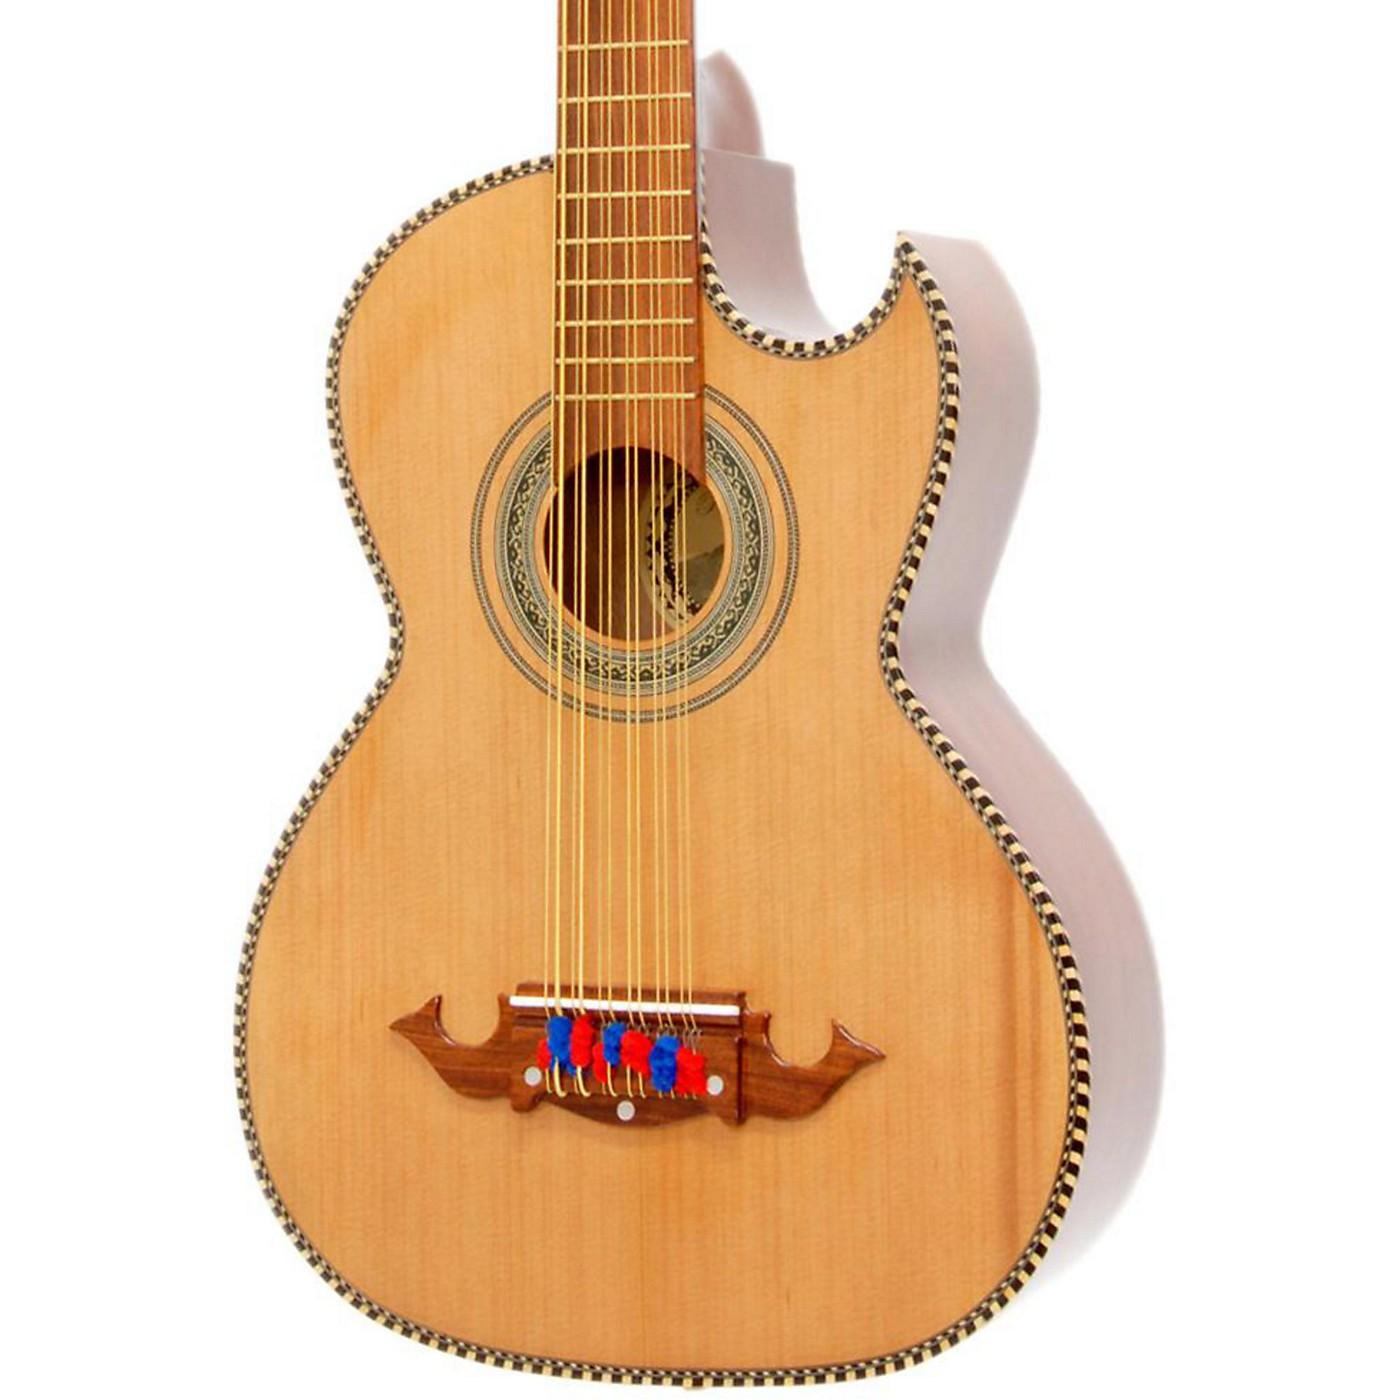 Paracho Elite Guitars Victoria-P 12 String Acoustic-Electric Bajo Sexto thumbnail